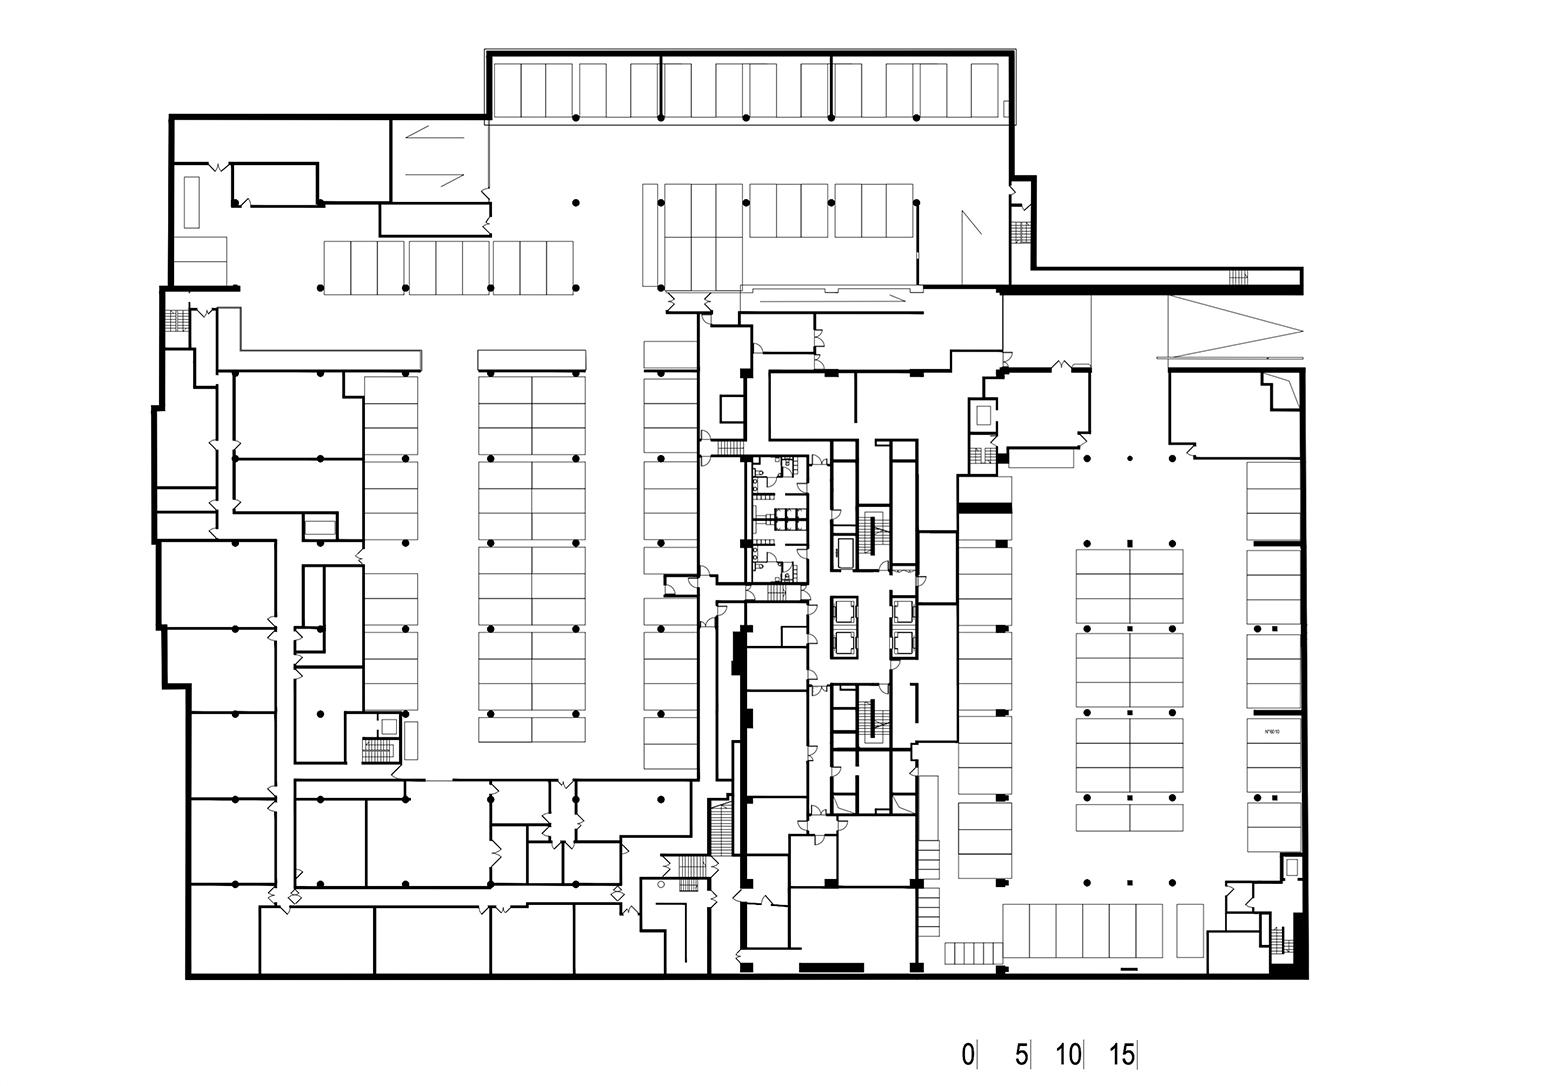 Renovation sous sol plan plan de maison avec sous sol for Plan sous sol